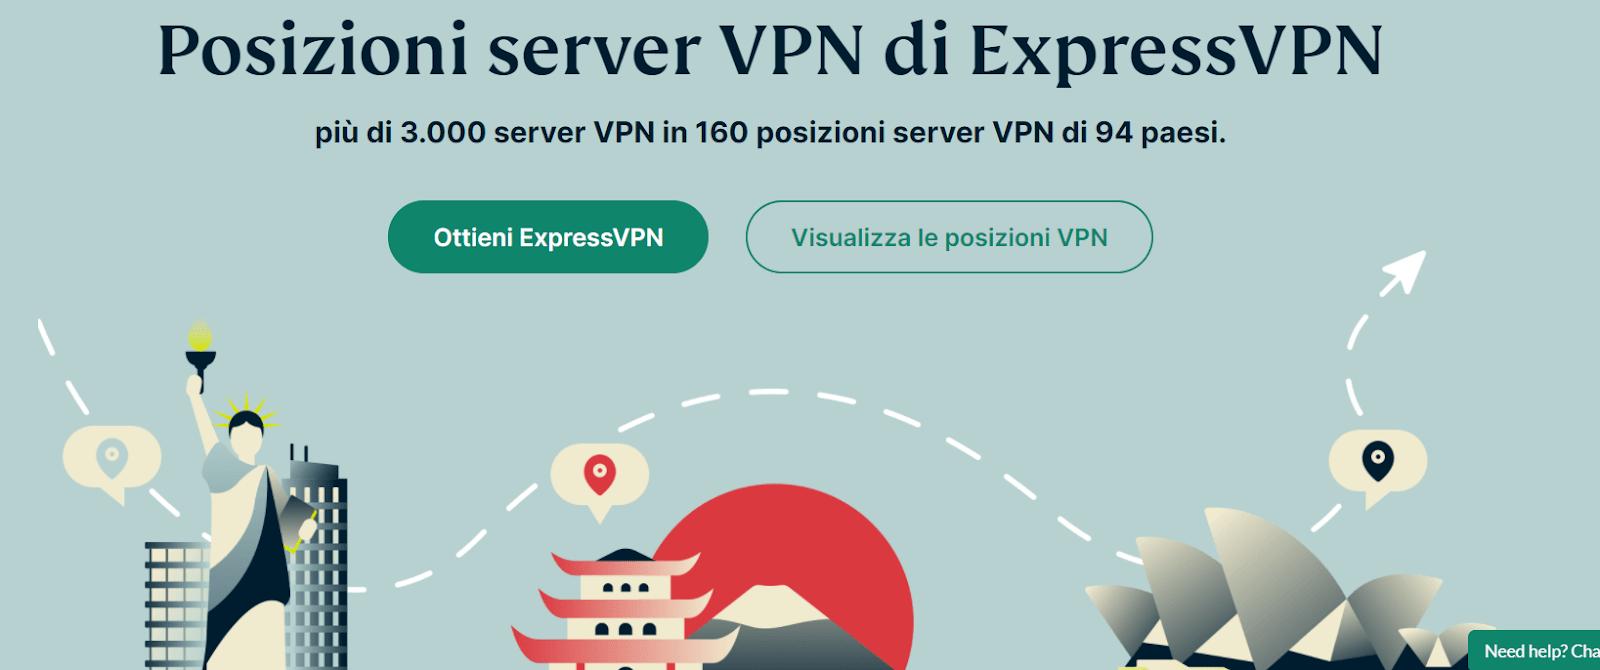 expressvpn it 3